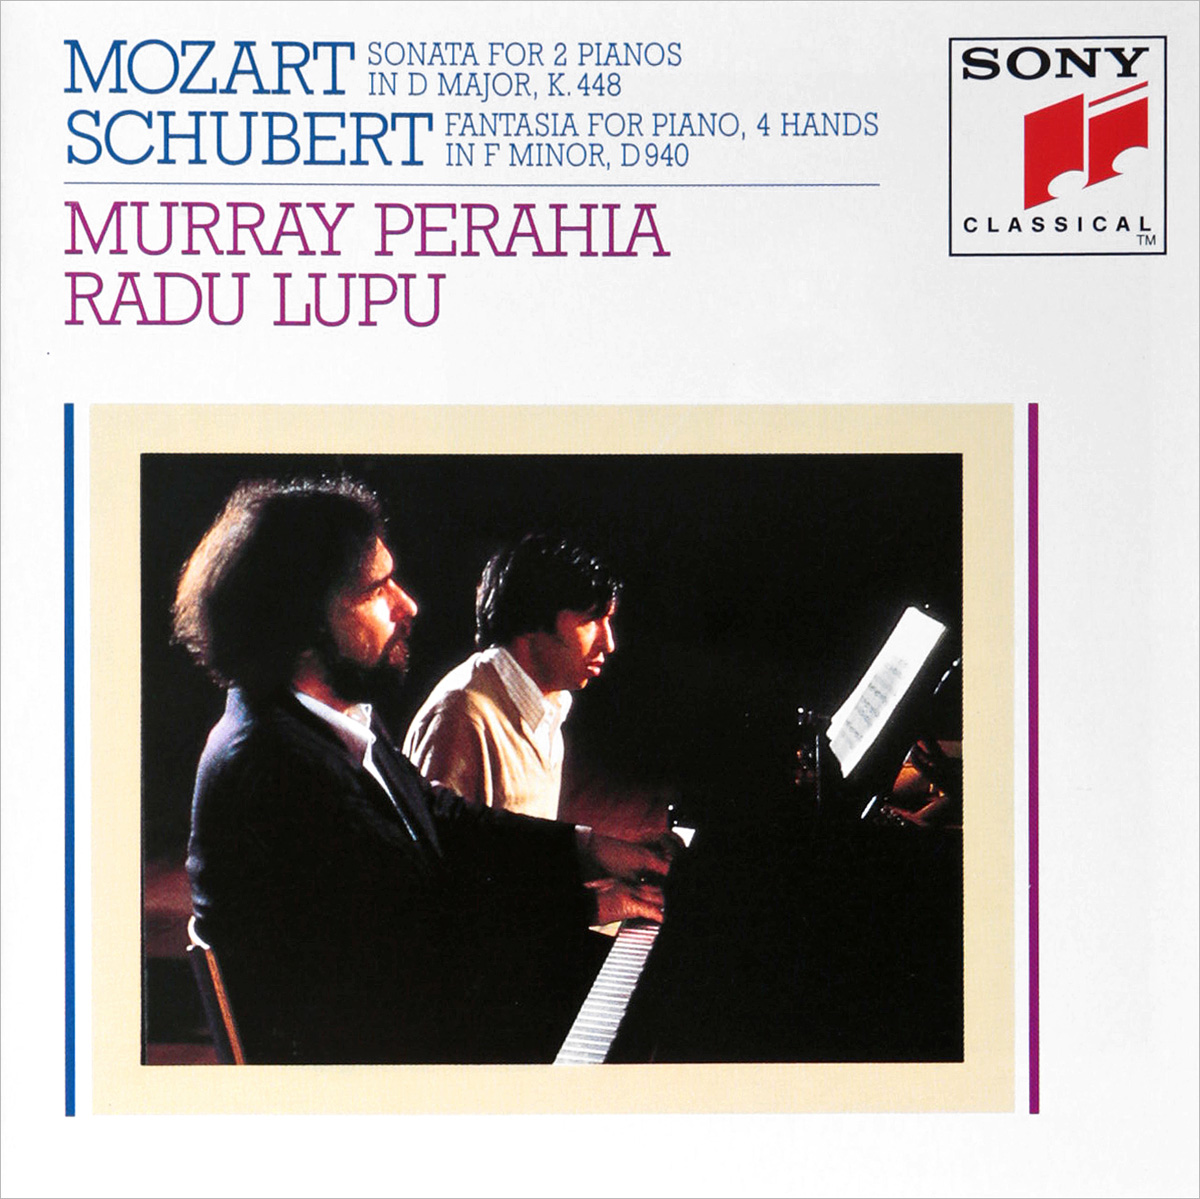 Murray Perahia, Radu Lupu. Mozart: Sonata in D Major for Two Piano mozart for kids